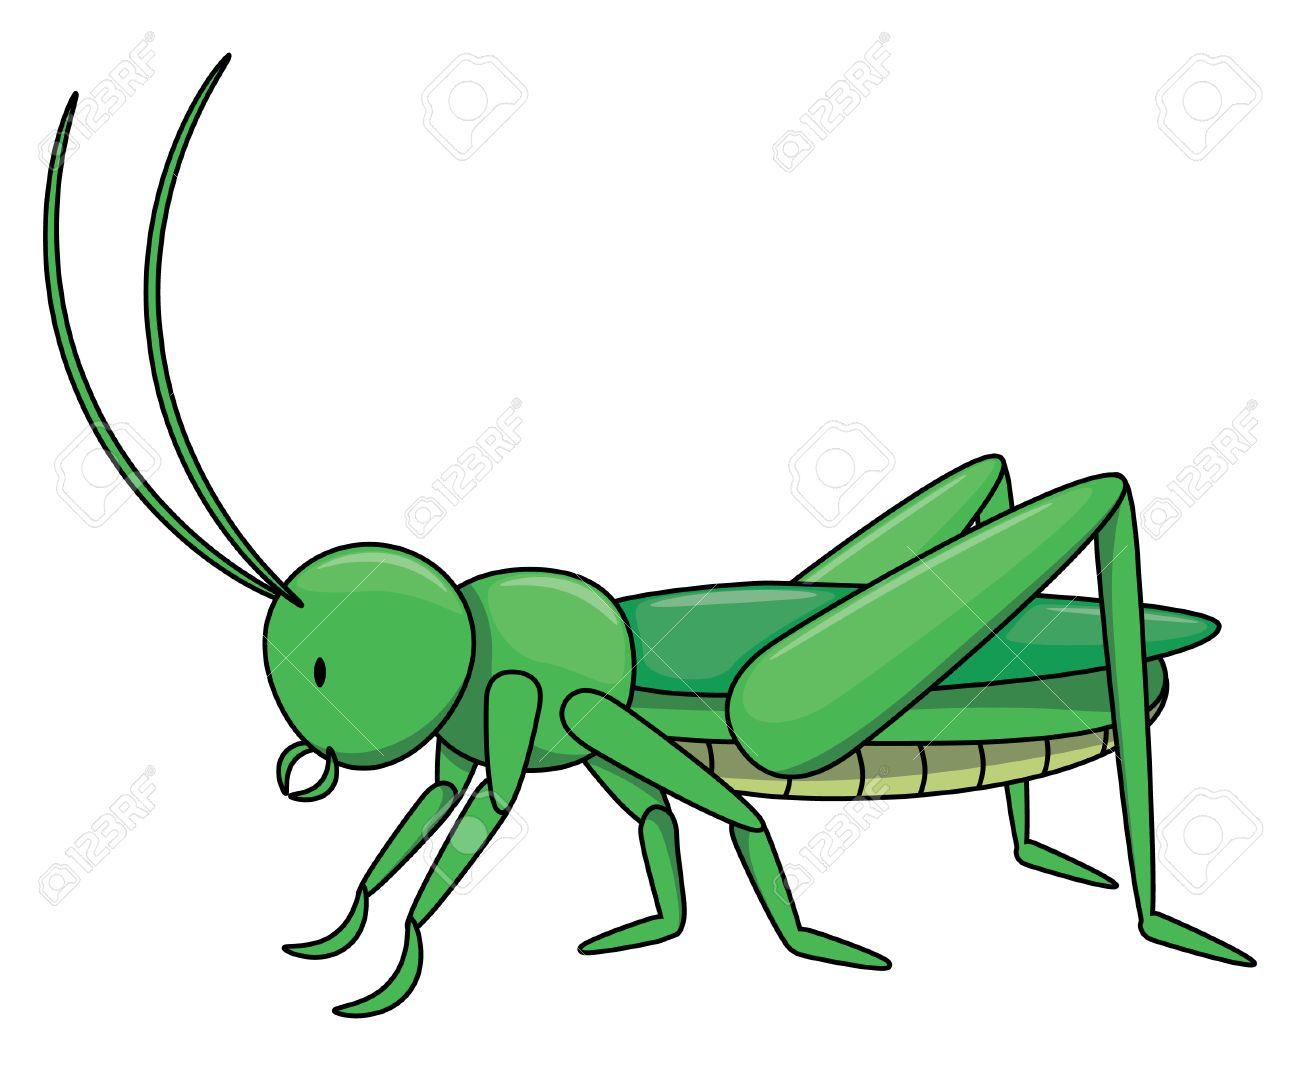 Locust cartoon illustration isolated white.